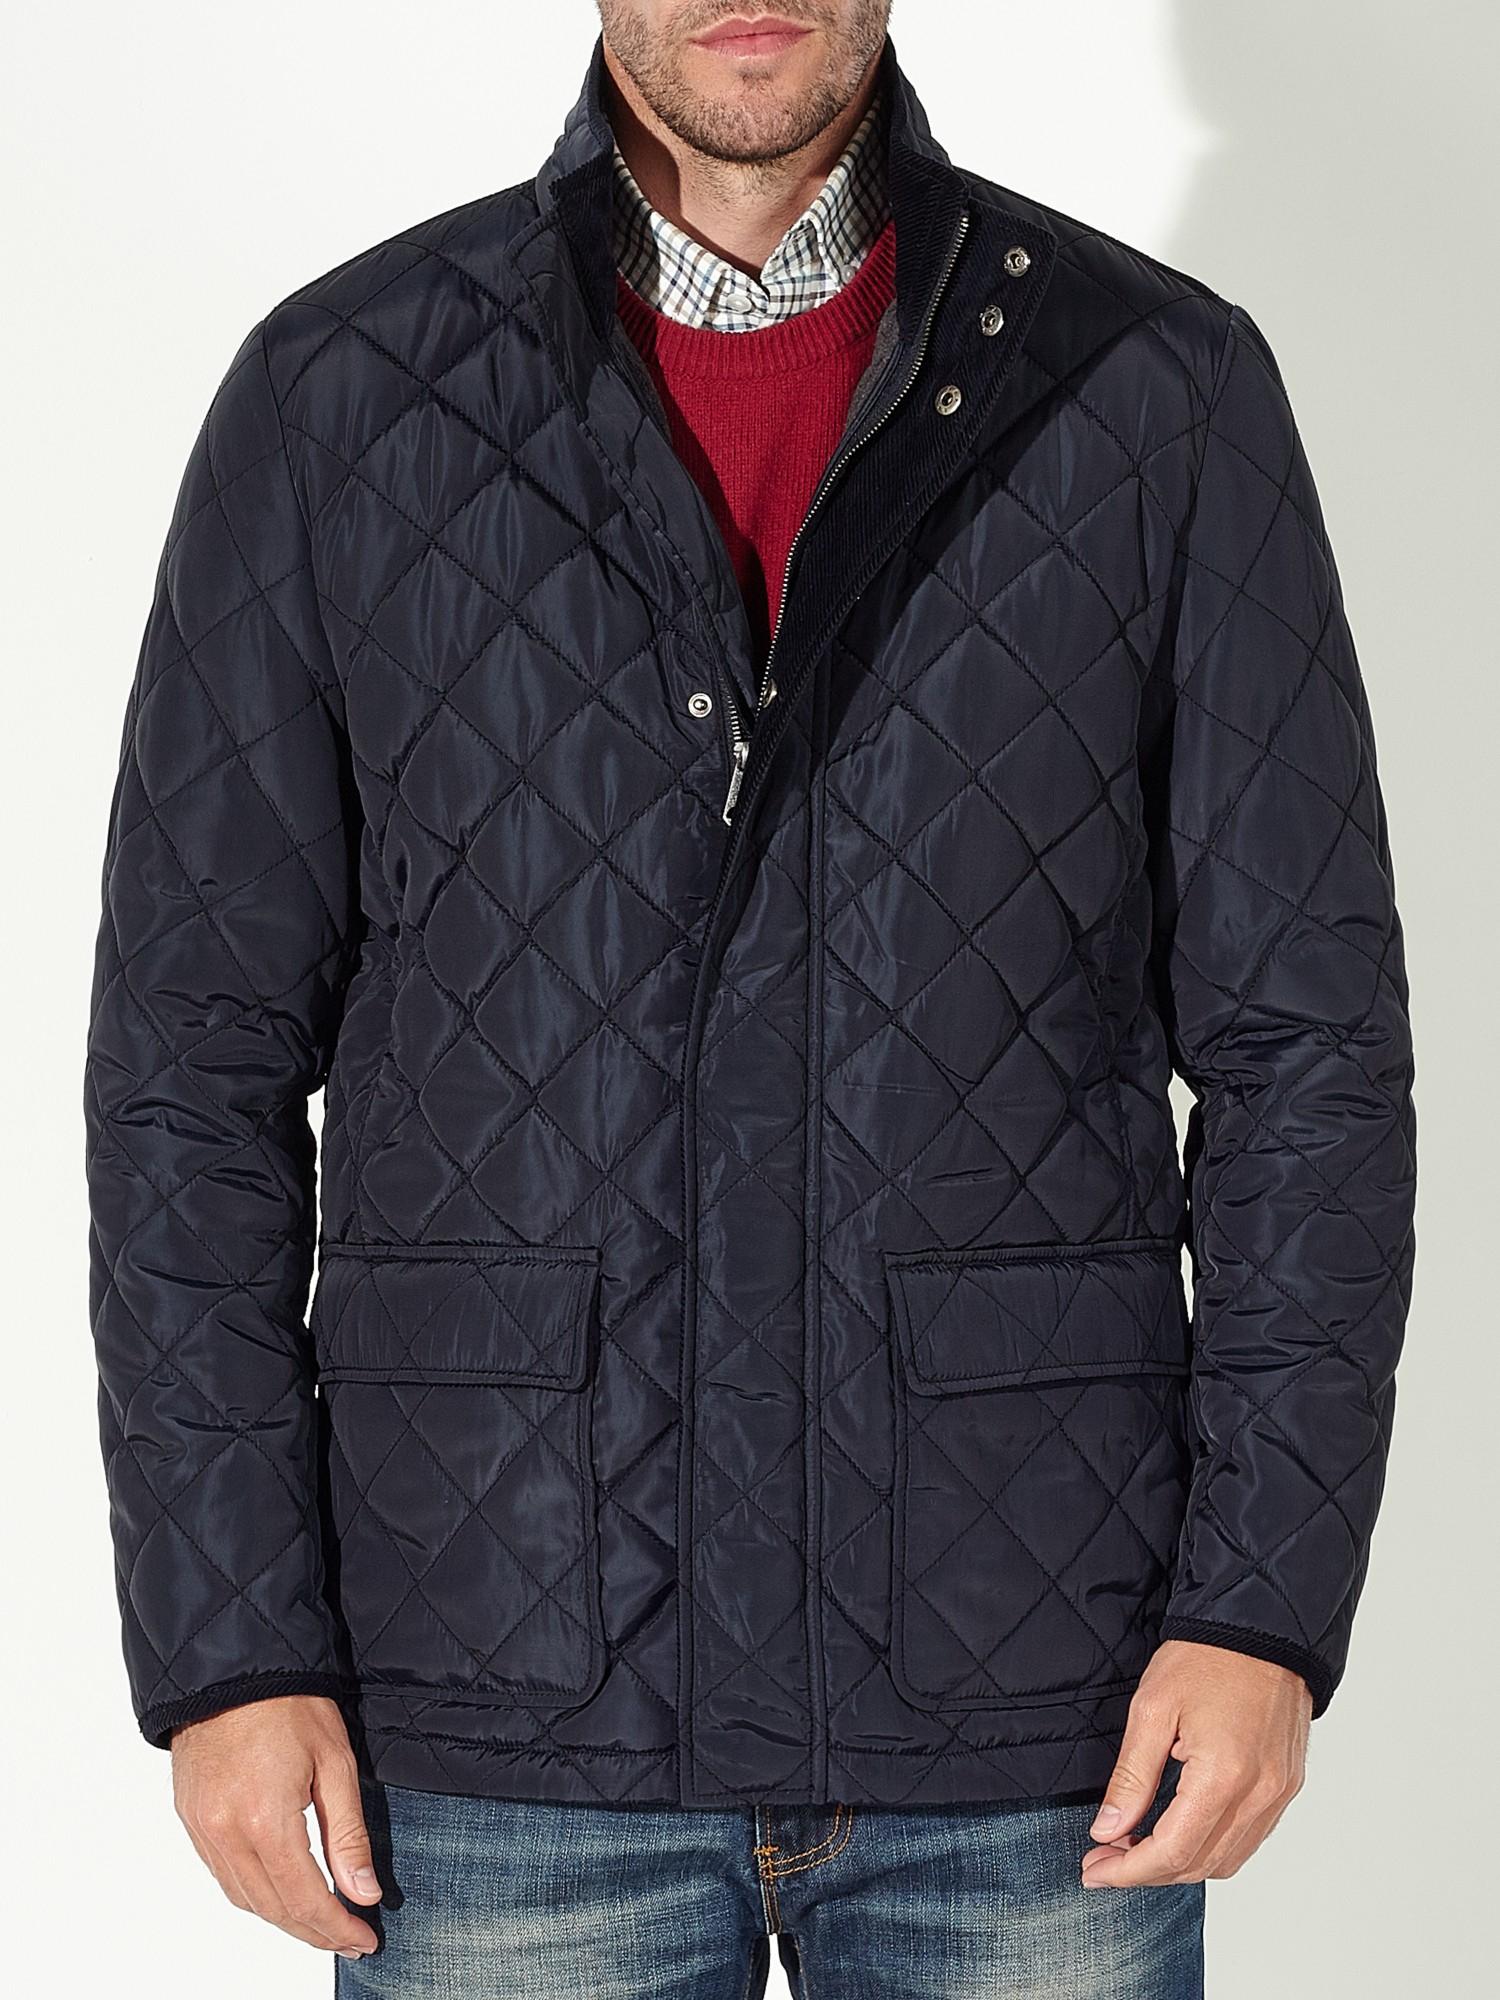 John lewis womens jackets